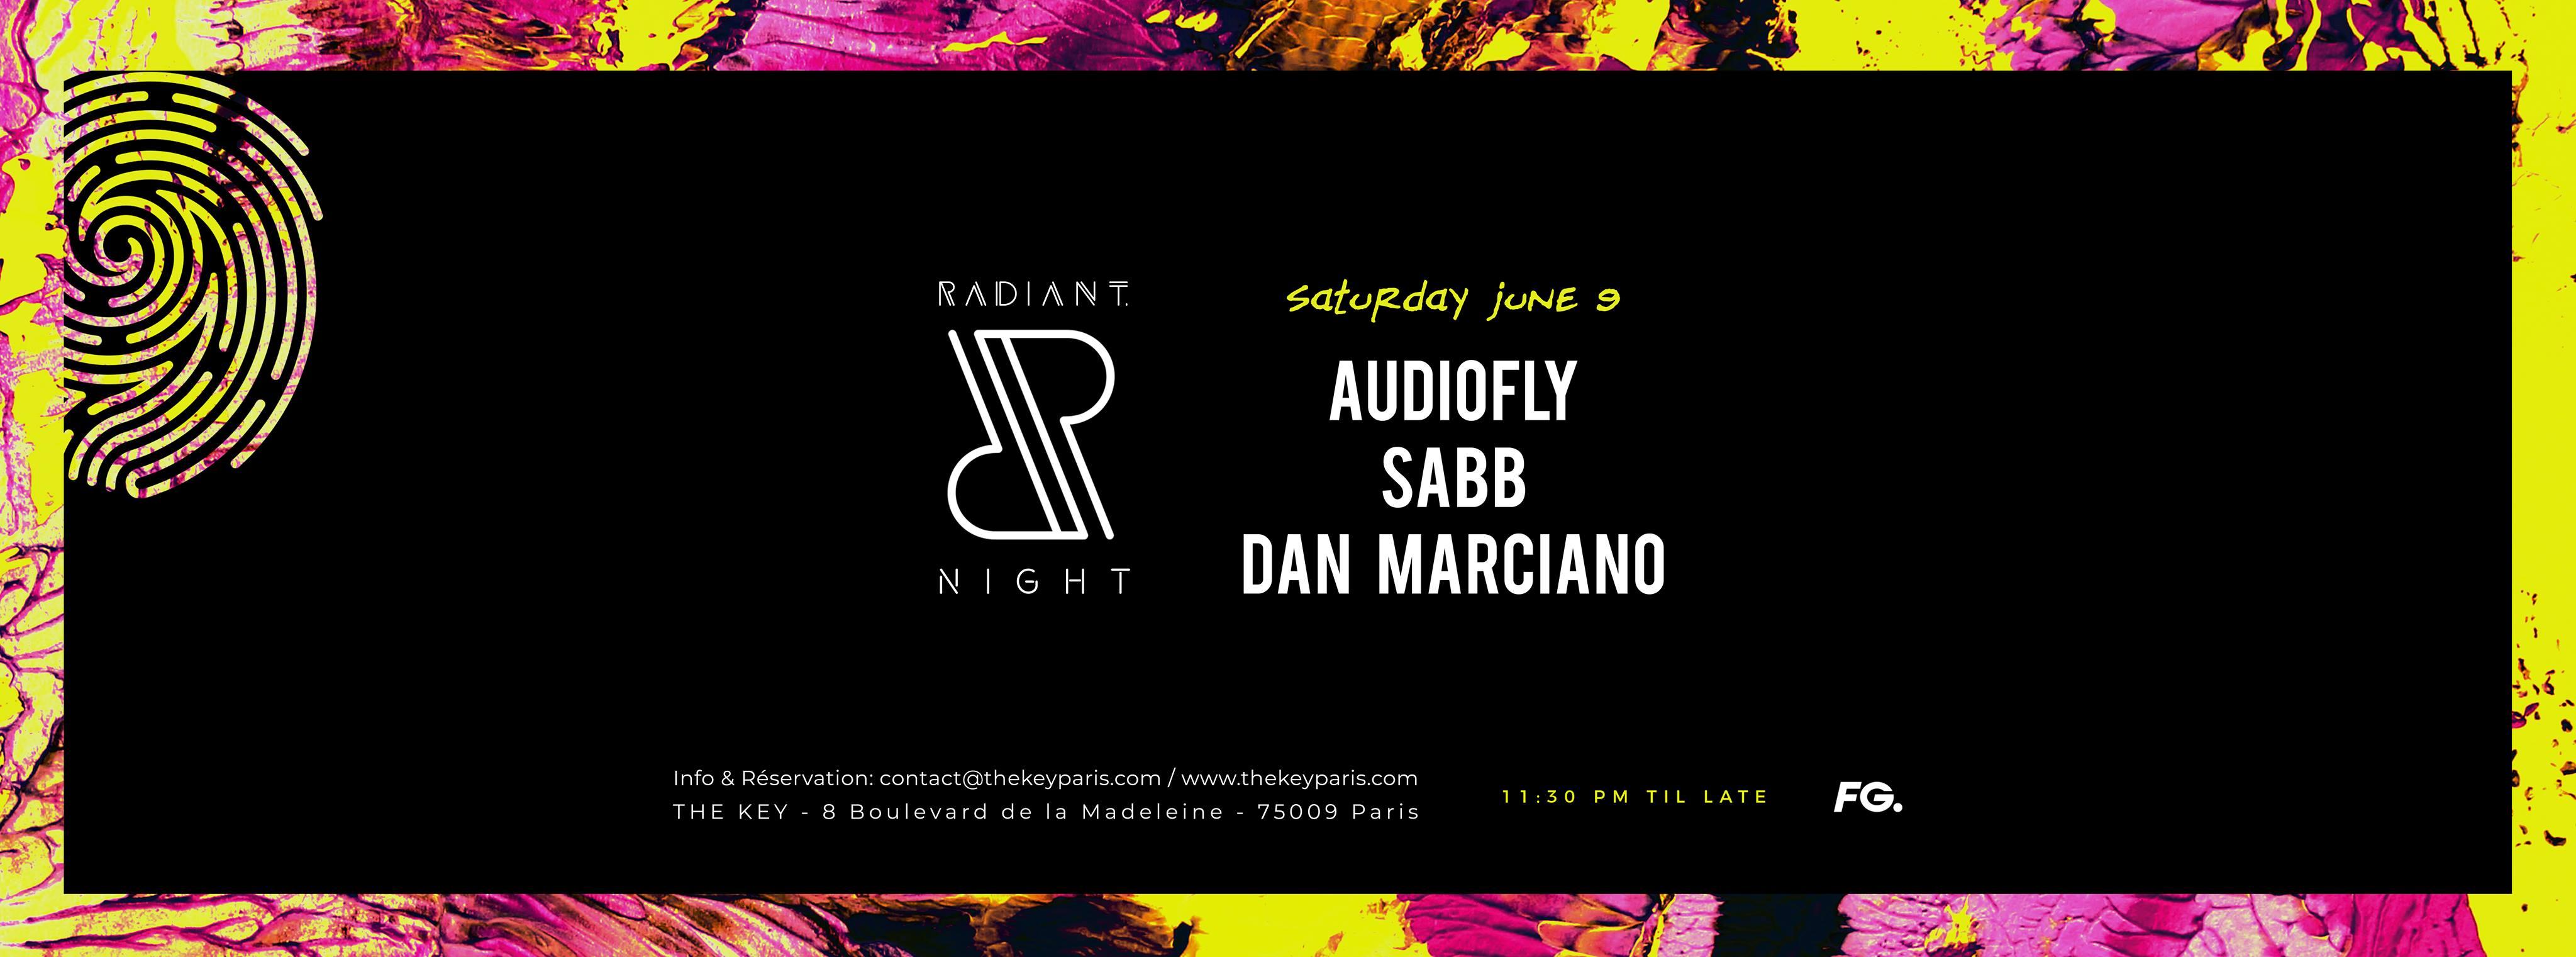 The Key x Radiant. Night : Audiofly, Sabb, Dan Marciano